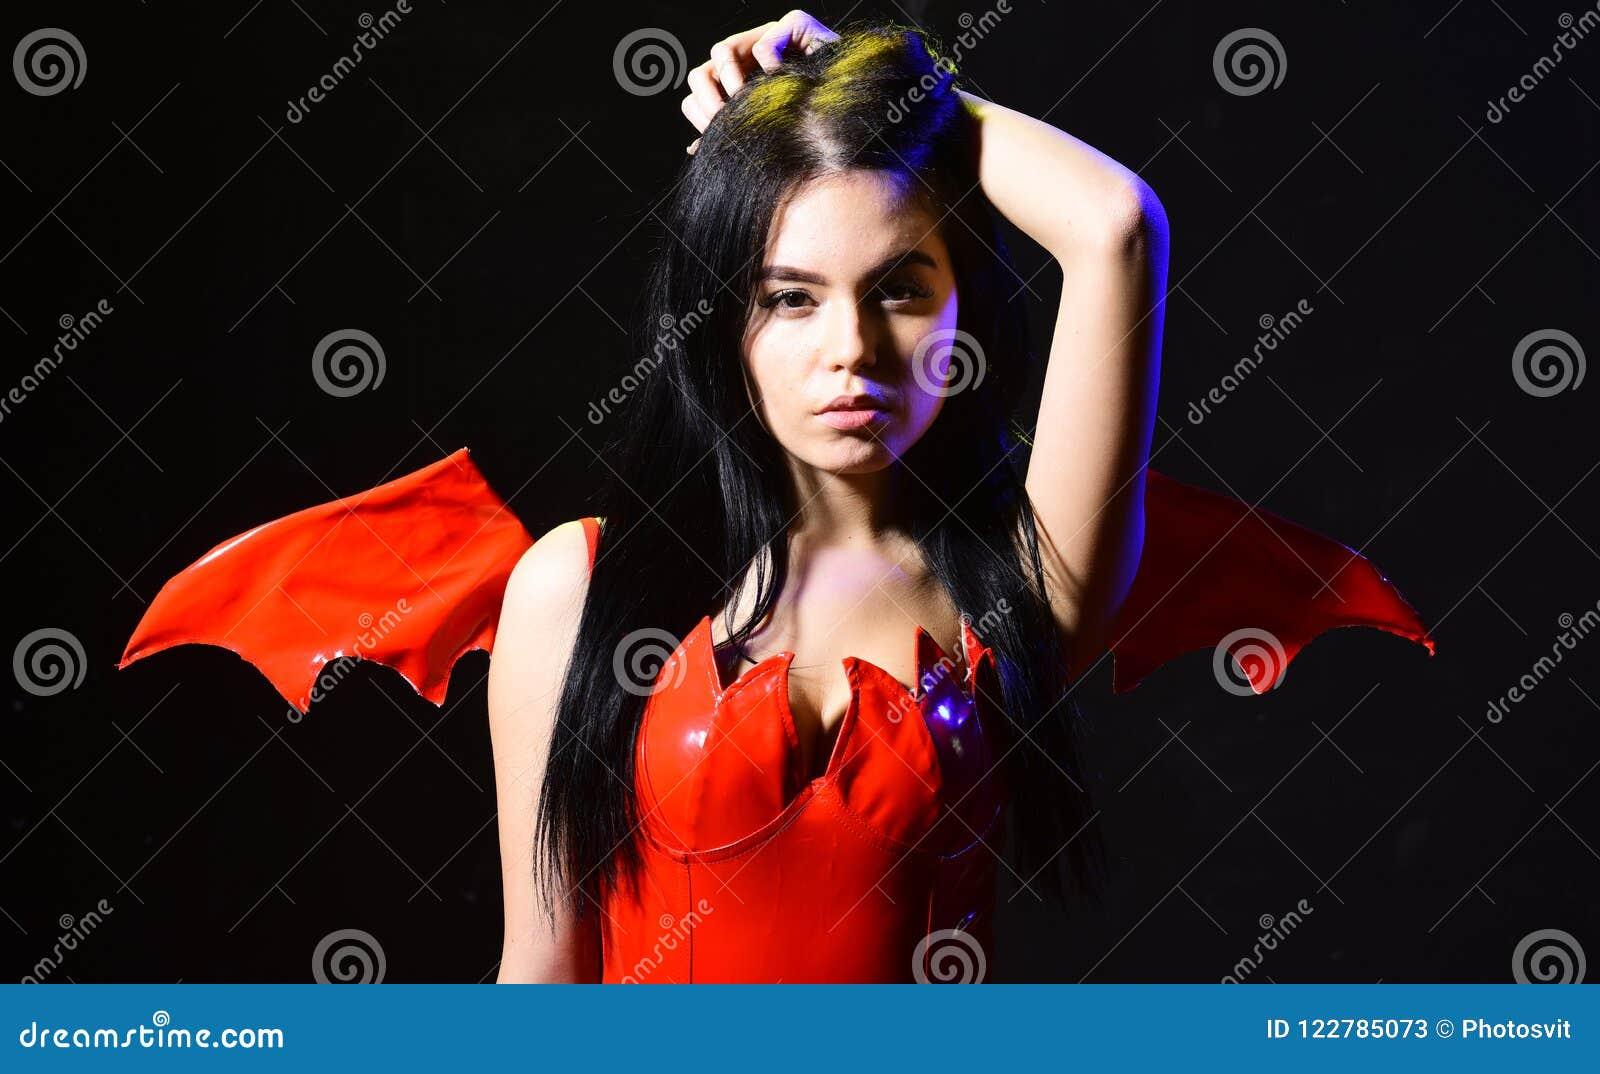 Sexi De La Señora Vestido Como Demonio Diablo Fondo Negro